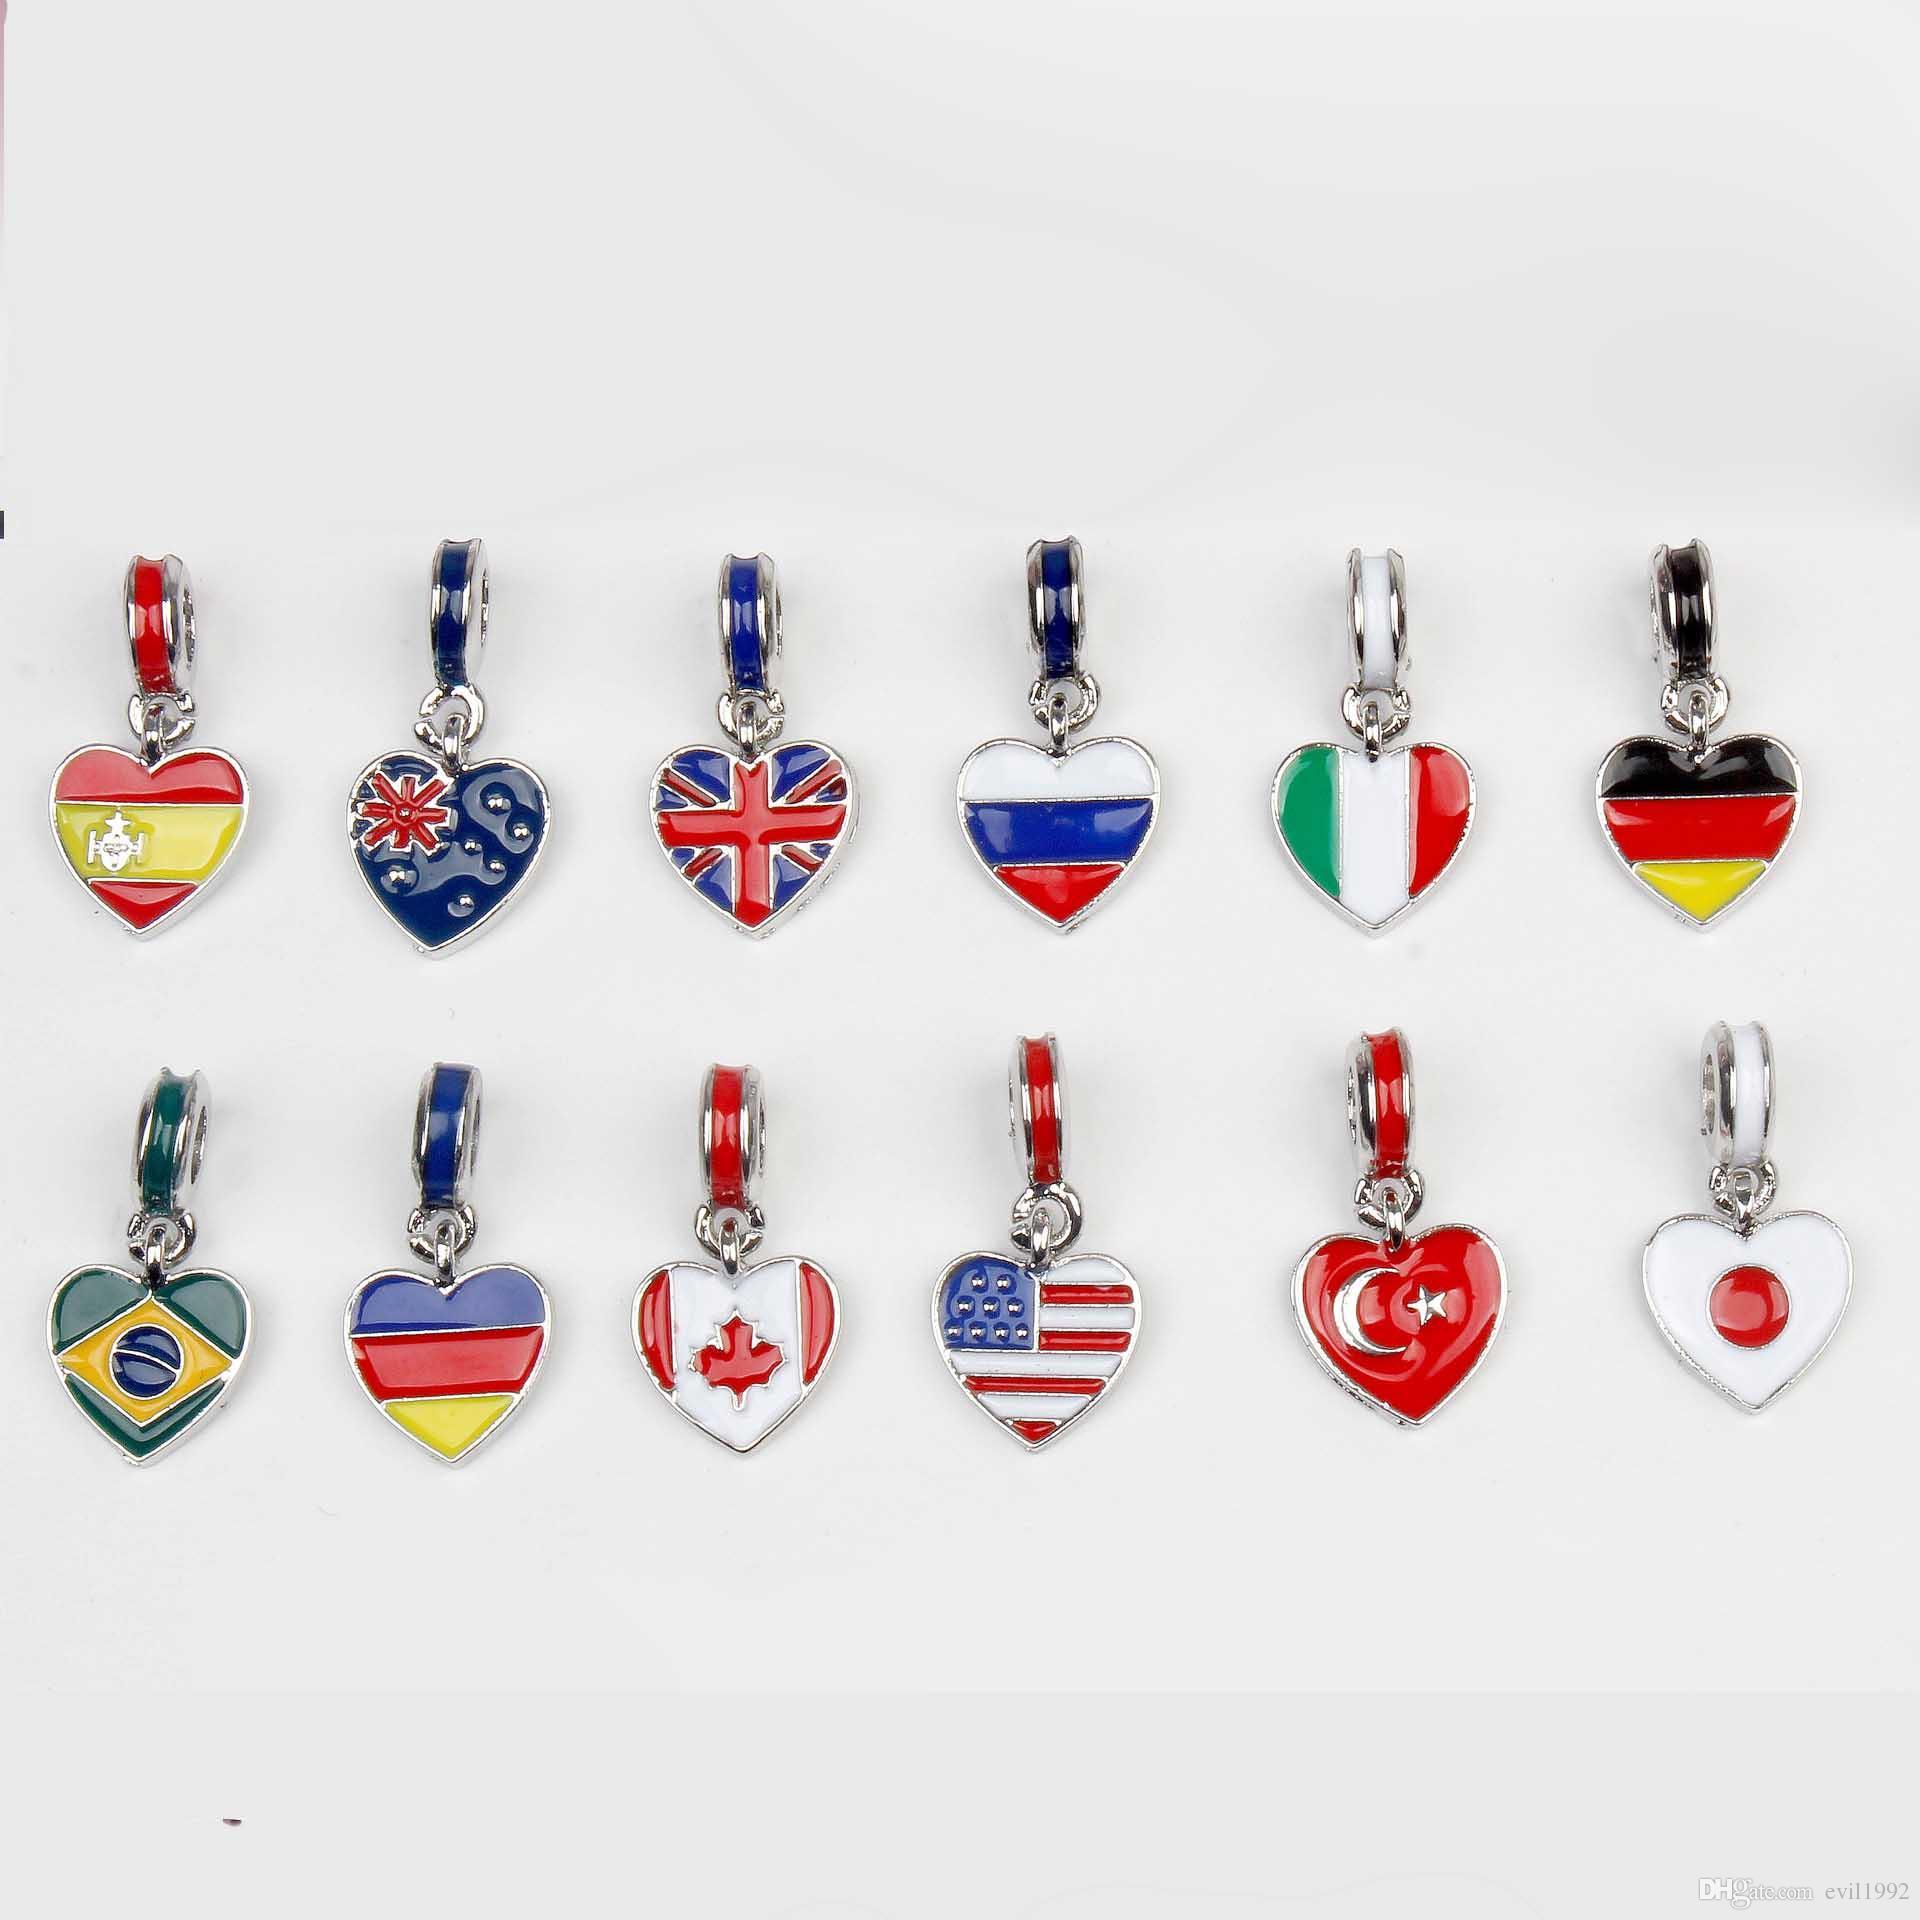 20pcs 드롭 선적 실버 도금 국기 에나멜 펜던트 비즈 맞는 판도라 뱀 체인 유럽 팔찌 팔찌 여성 어린이 선물